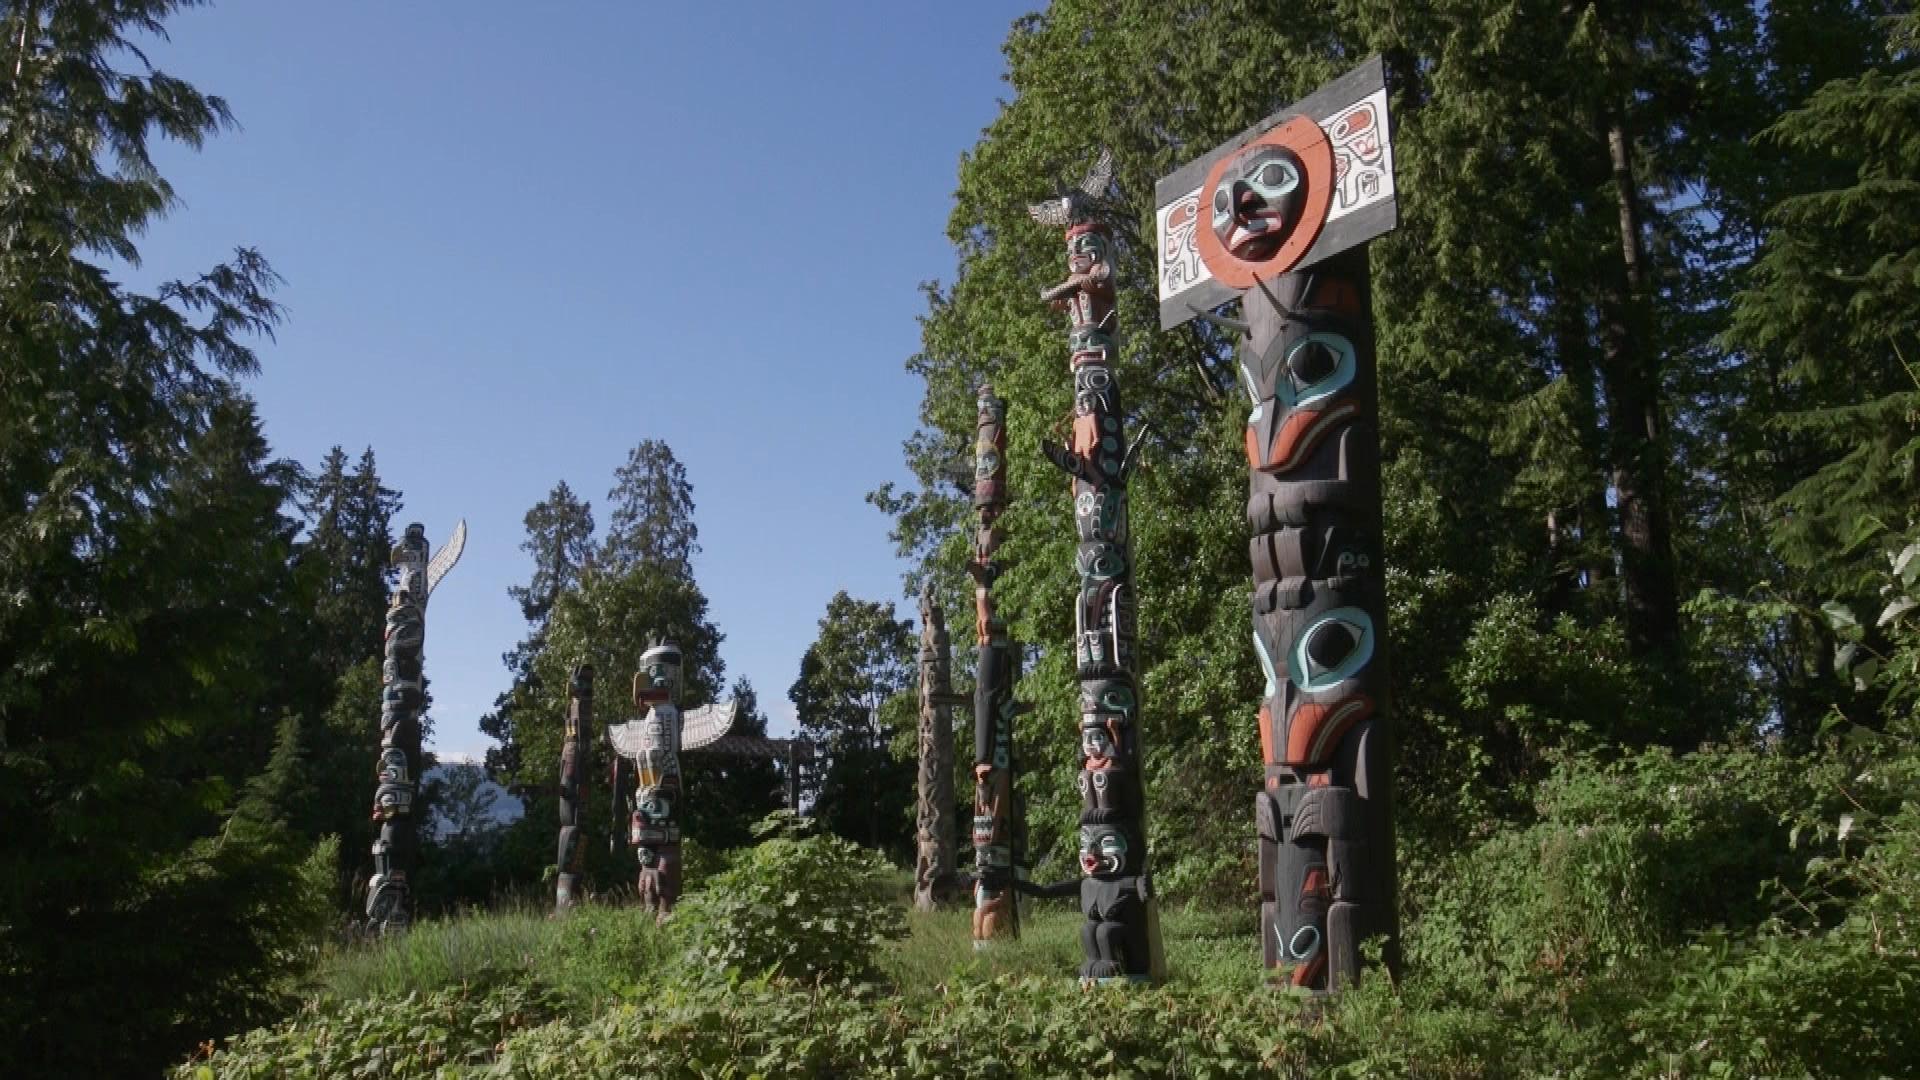 Totem poles at Bockton Point in Vancouver's Stanley Park